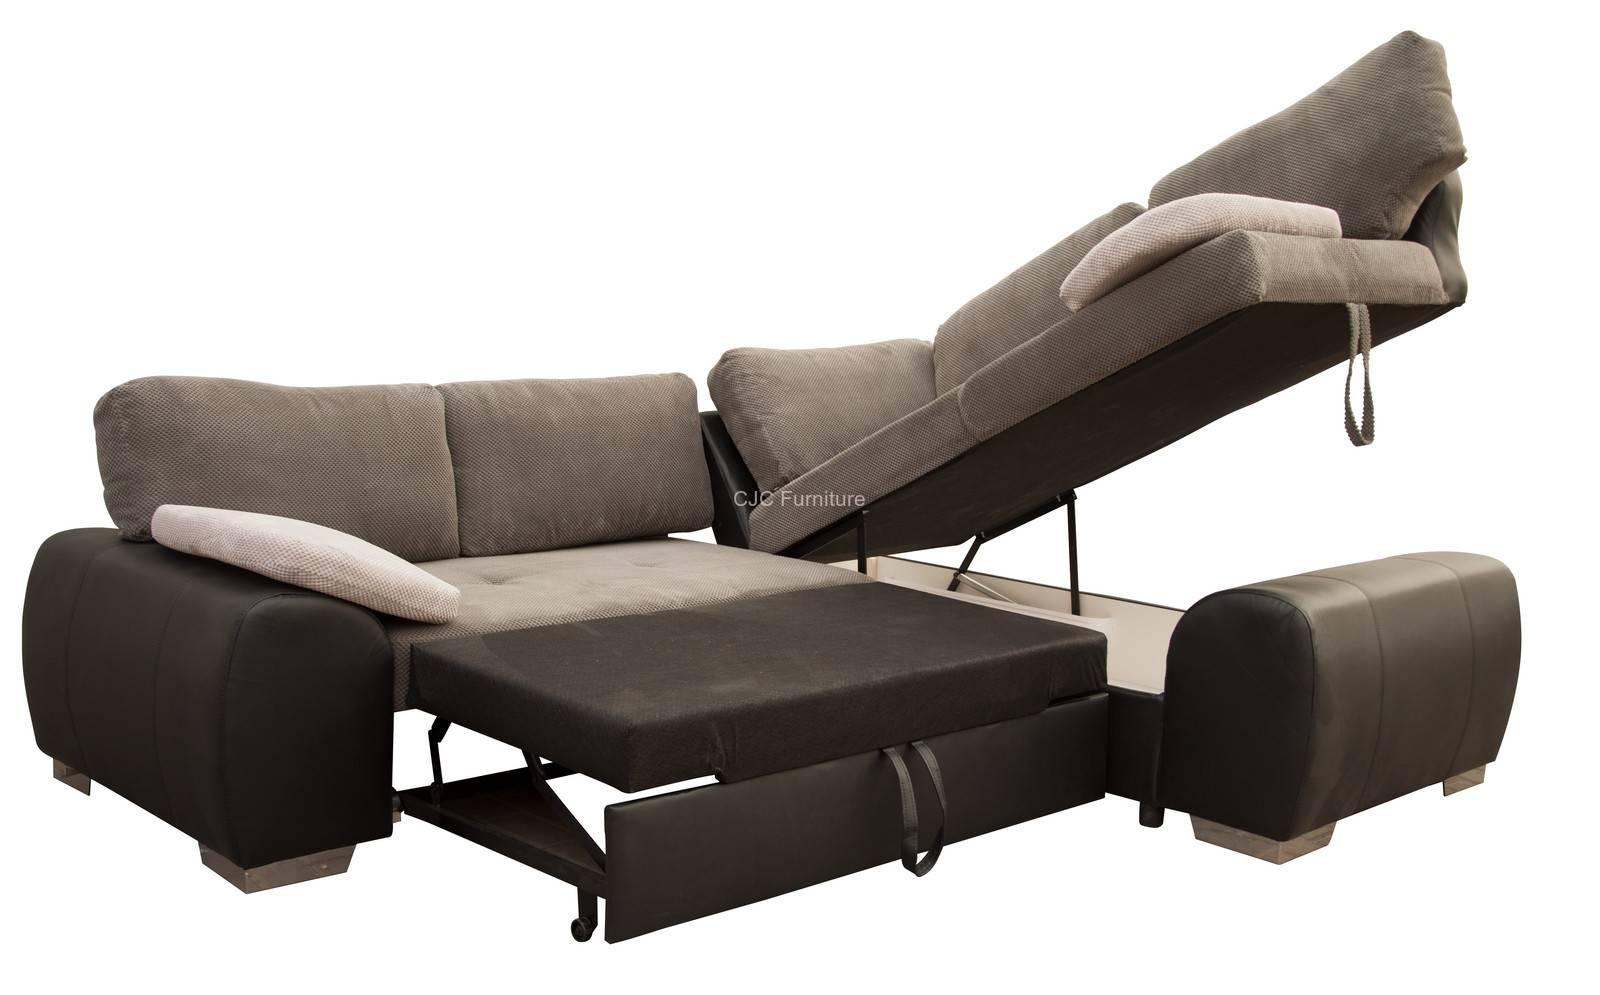 Birmingham Furniture - Cjcfurniture.co.uk Corner Sofa Beds regarding Fabric Corner Sofa Bed (Image 4 of 30)